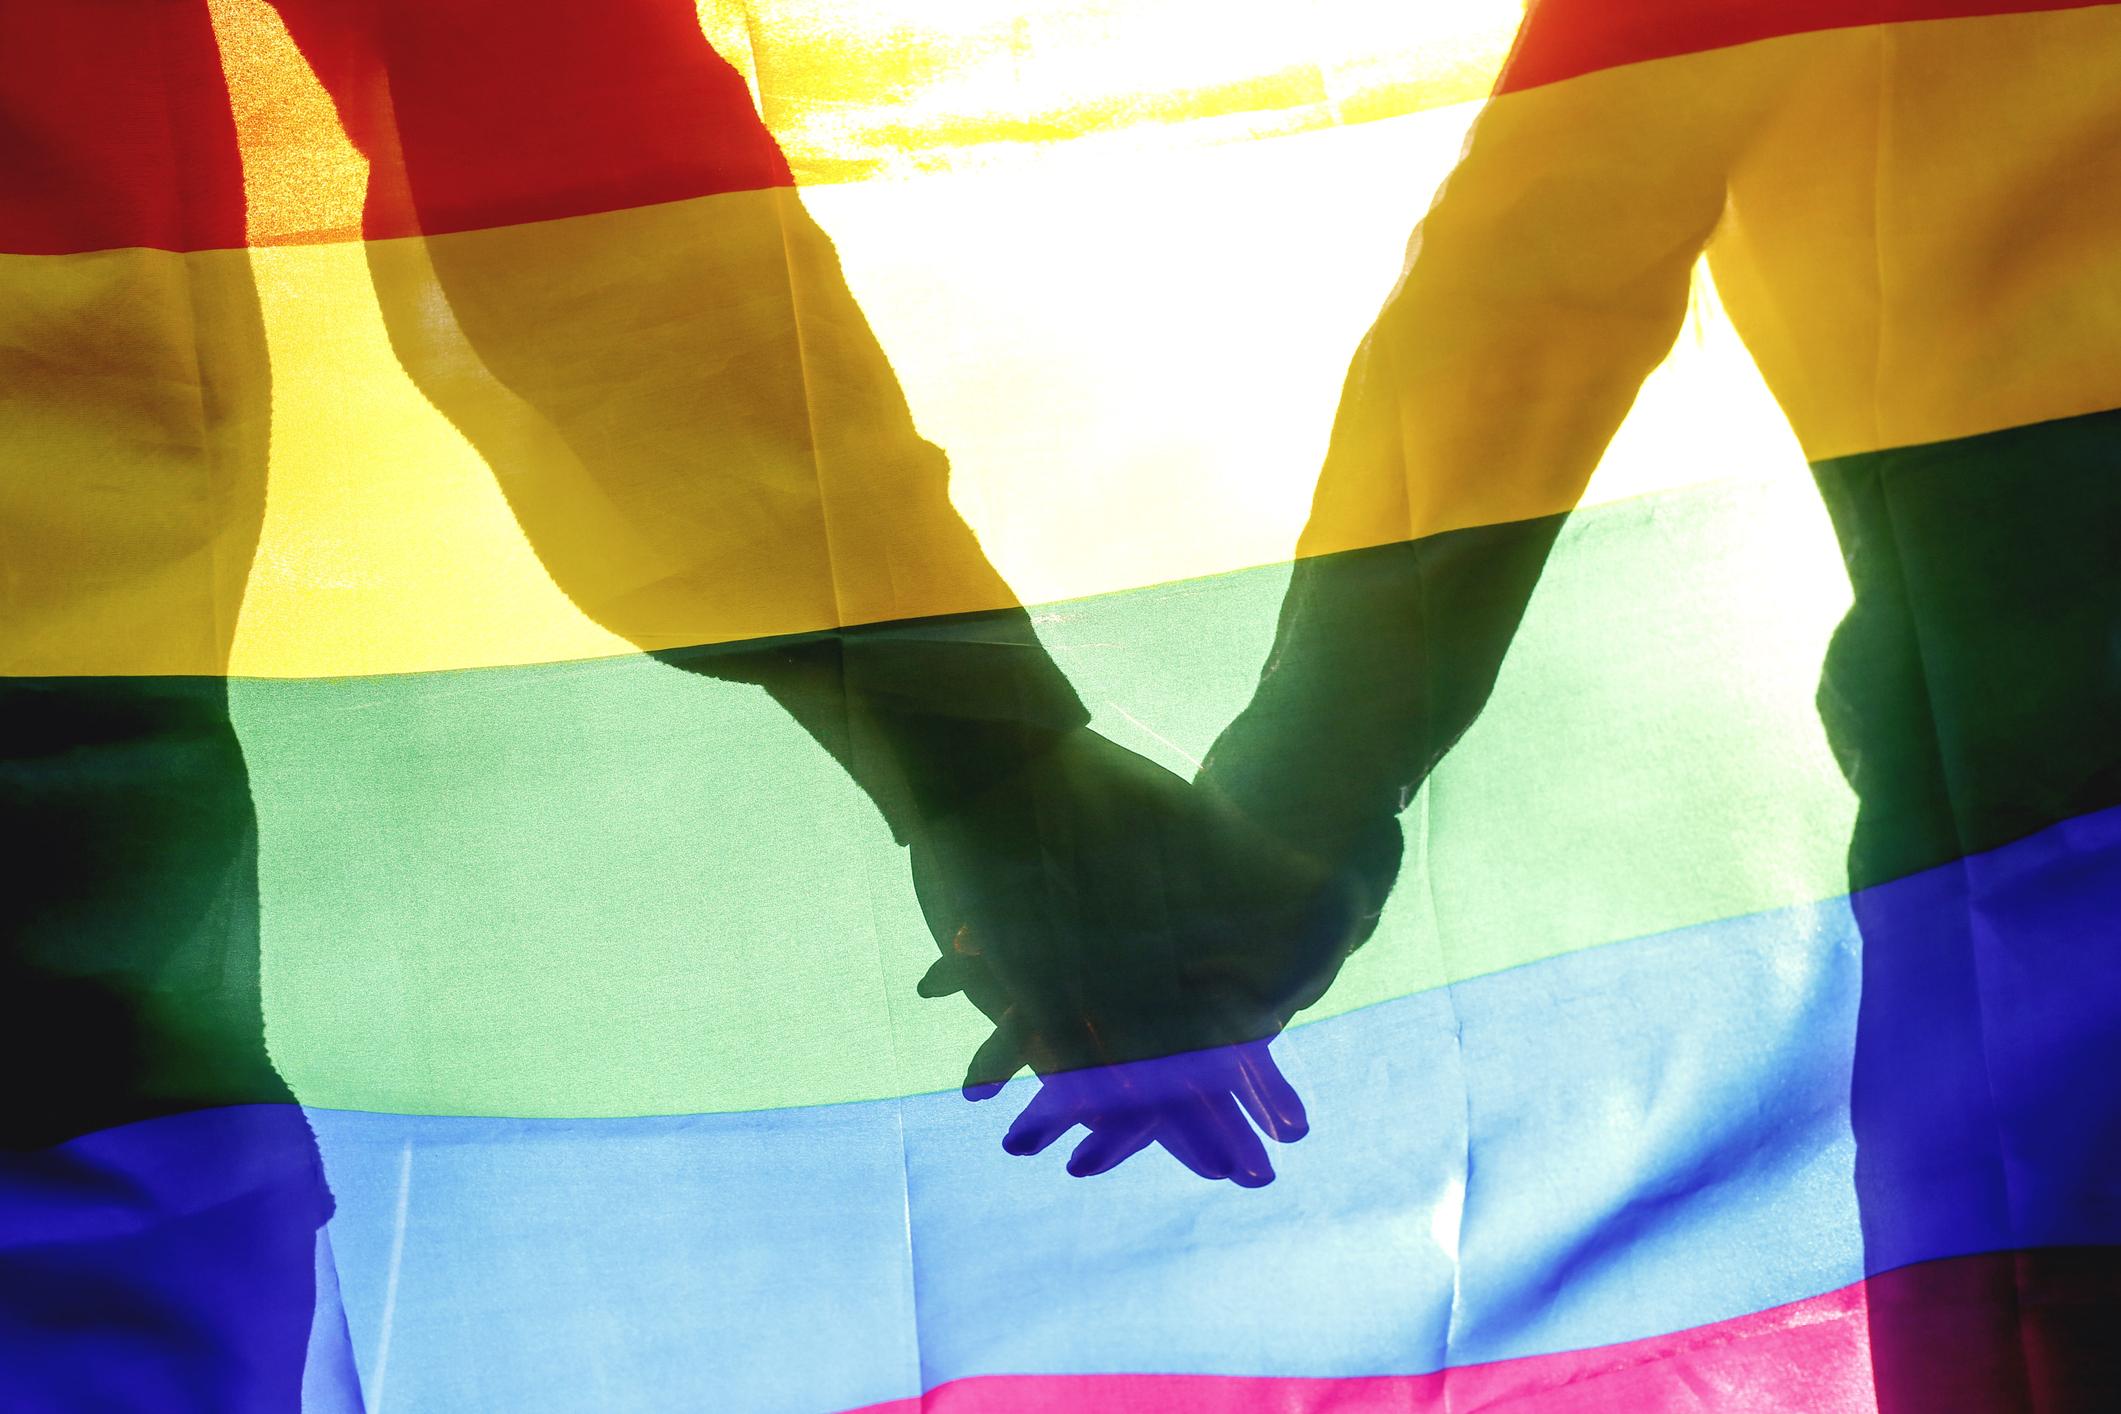 Poziv novinarima na poštovanje ljudskih prava LGBTQ osoba i novinarske etike